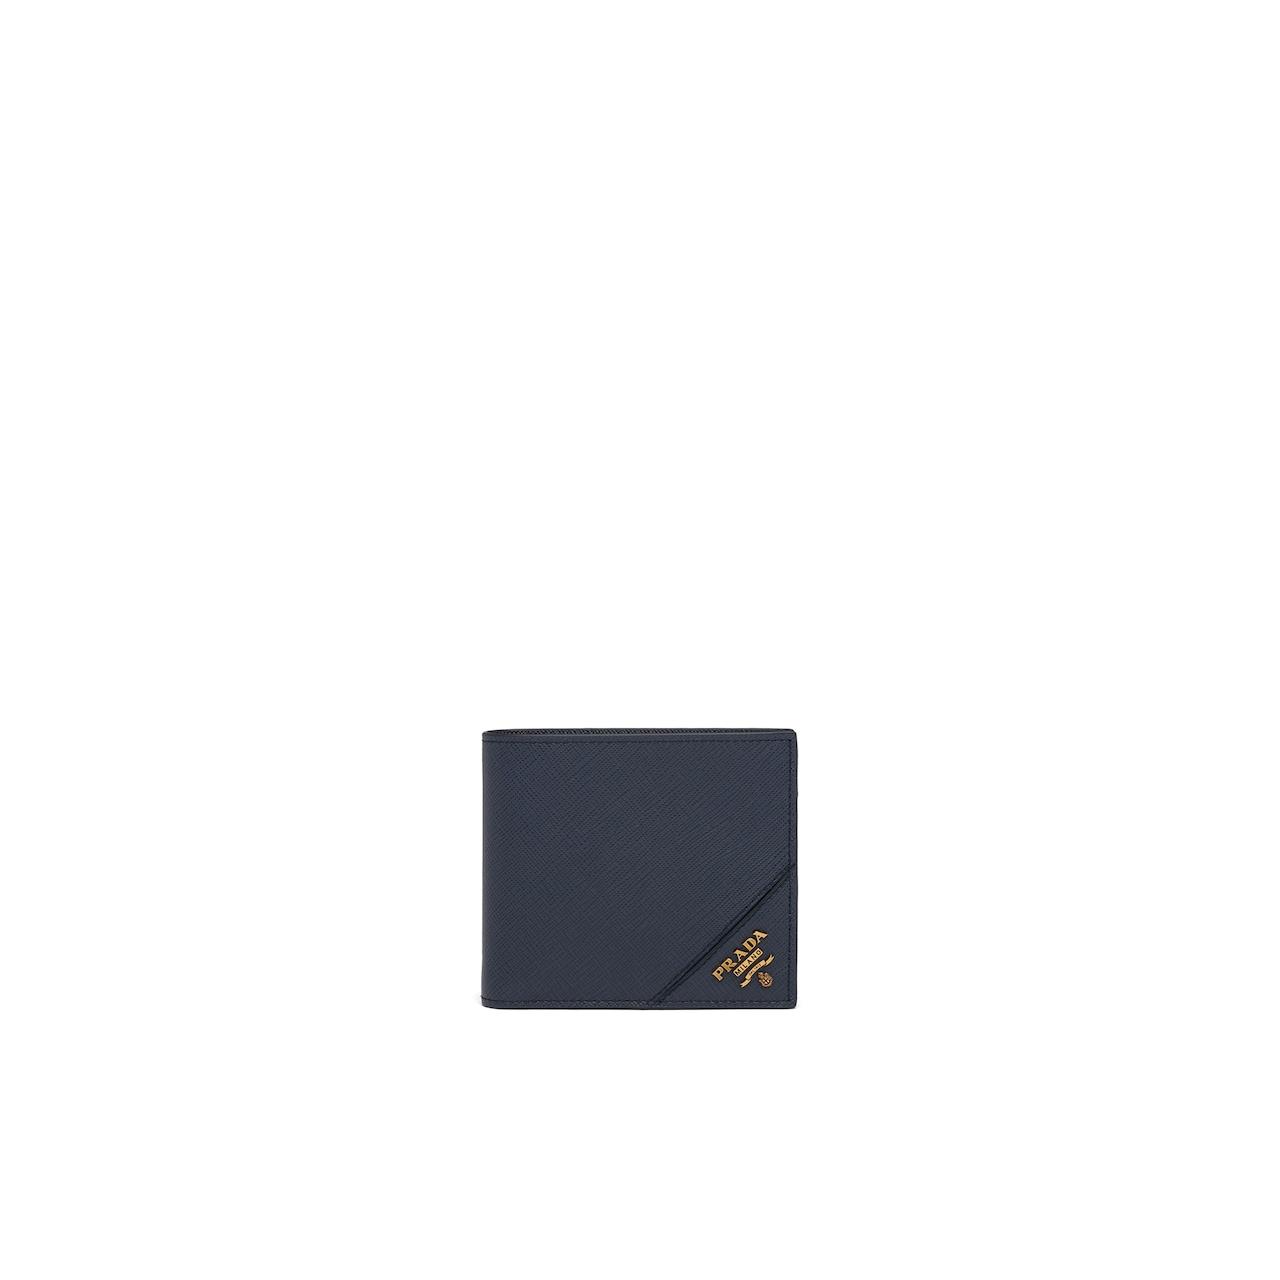 Prada 皮革钱夹 1